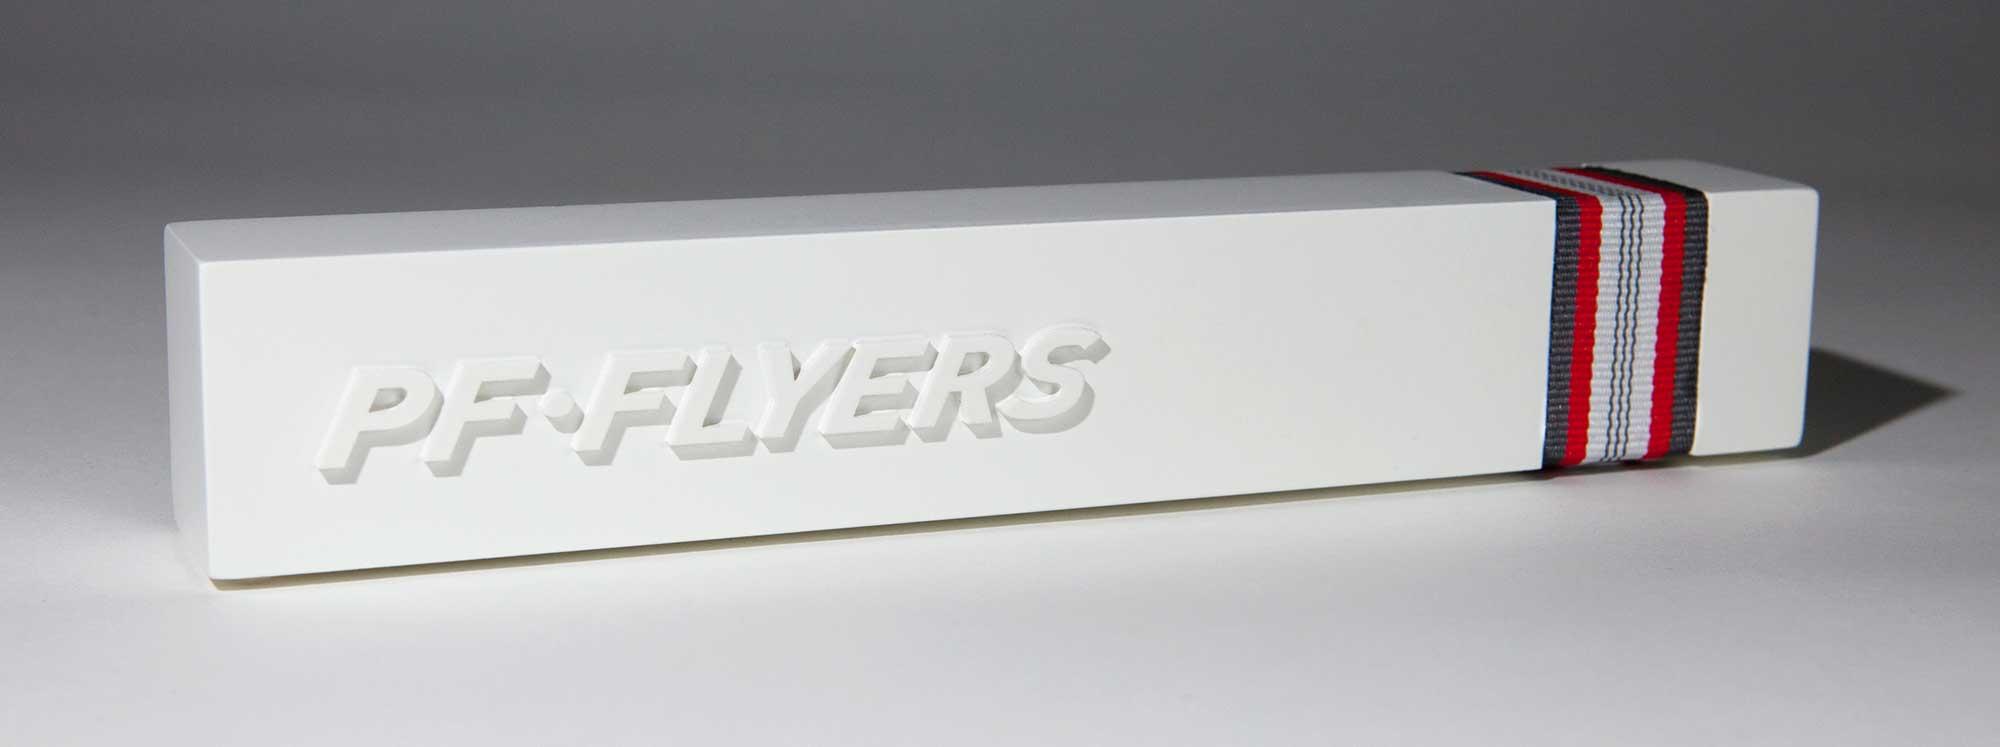 image of PF Flyers shoe display block